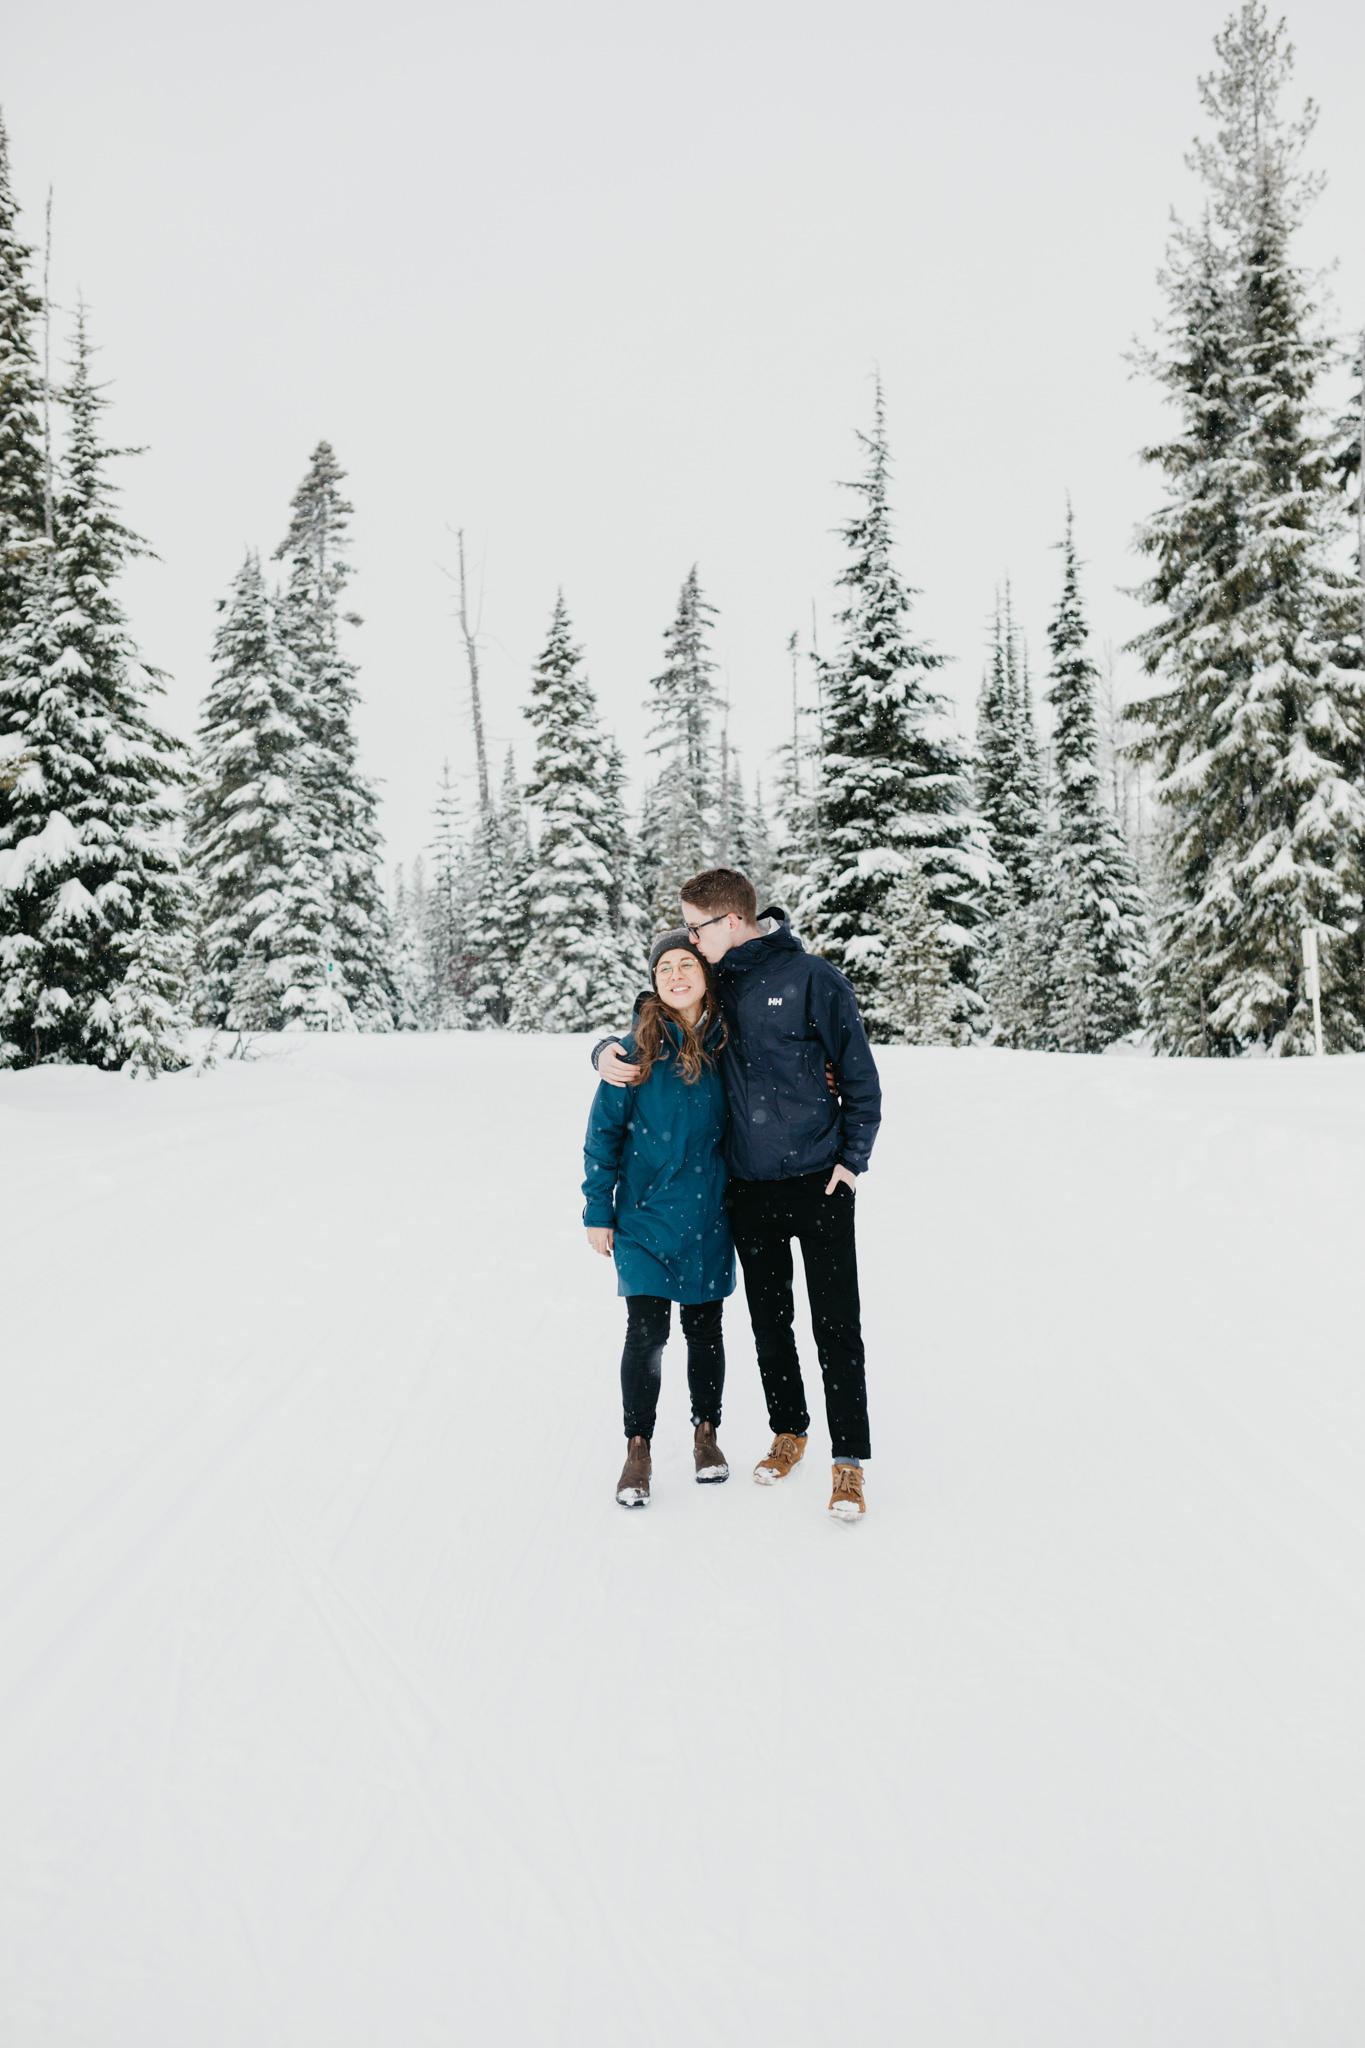 greg+jade-mount-washington-winter-engagement001.JPG